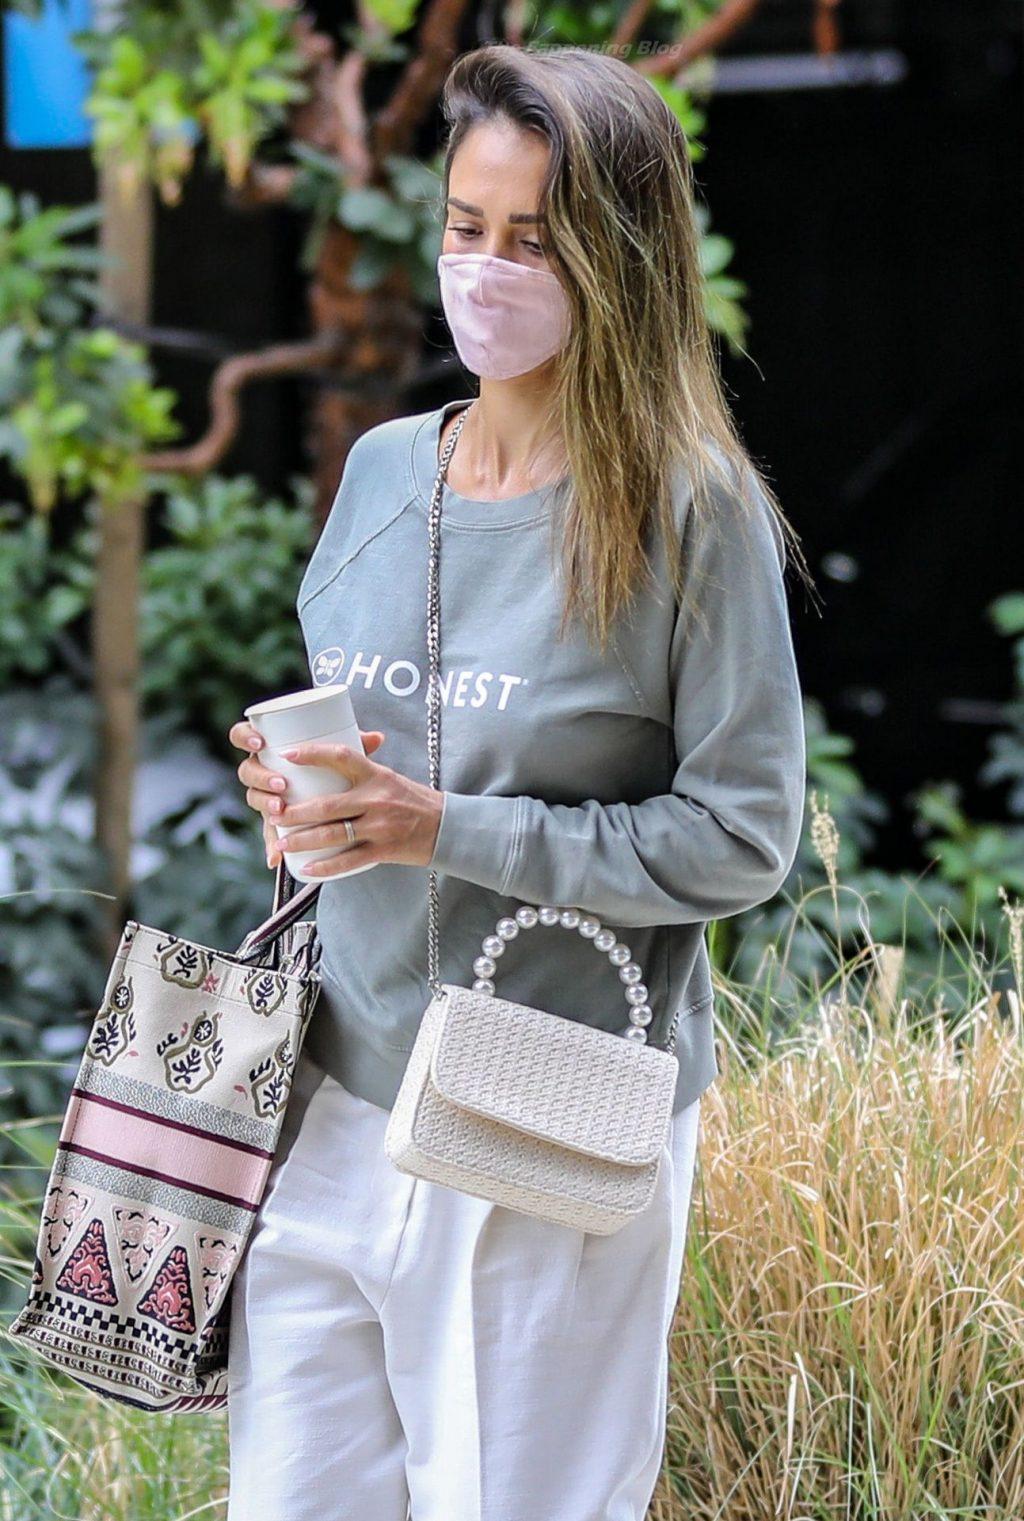 Braless Jessica Alba Arrives at Her Office Wearing an Honest Sweatshirt (45 Photos)